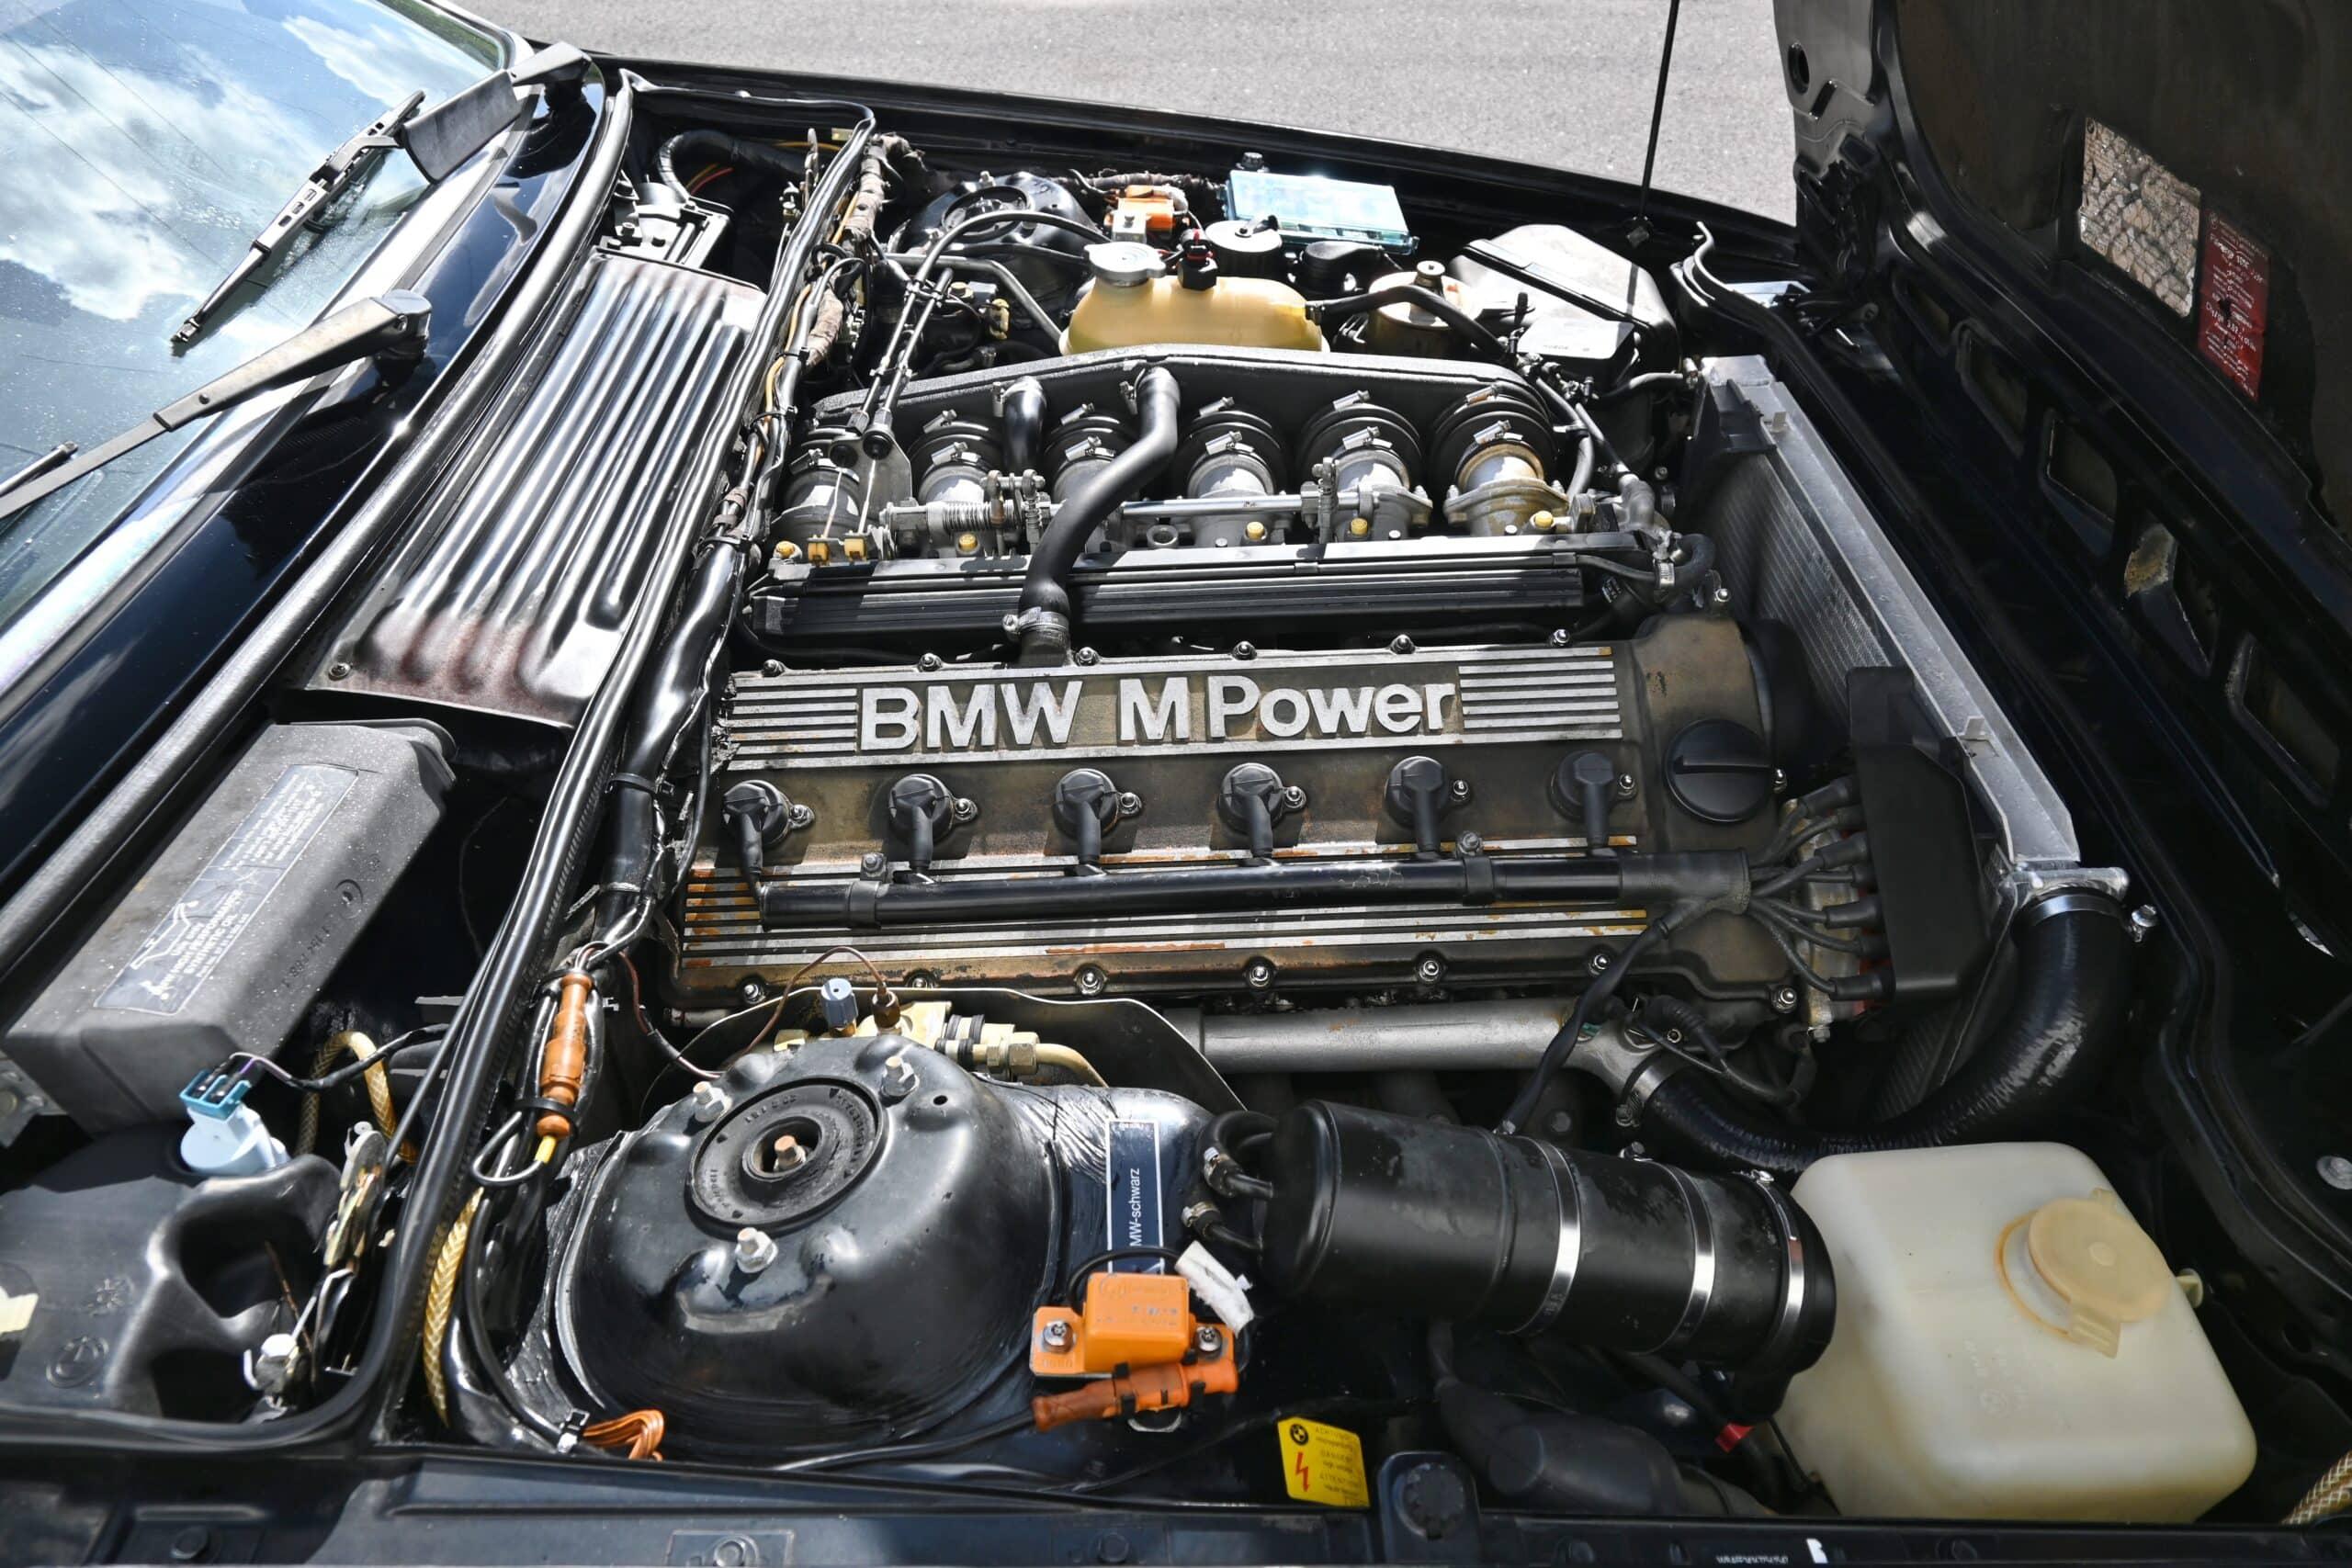 1988 BMW M6 E24 California Car-Original Paint -Clean history -5 Speed Manual -Rare Dinan Wheels